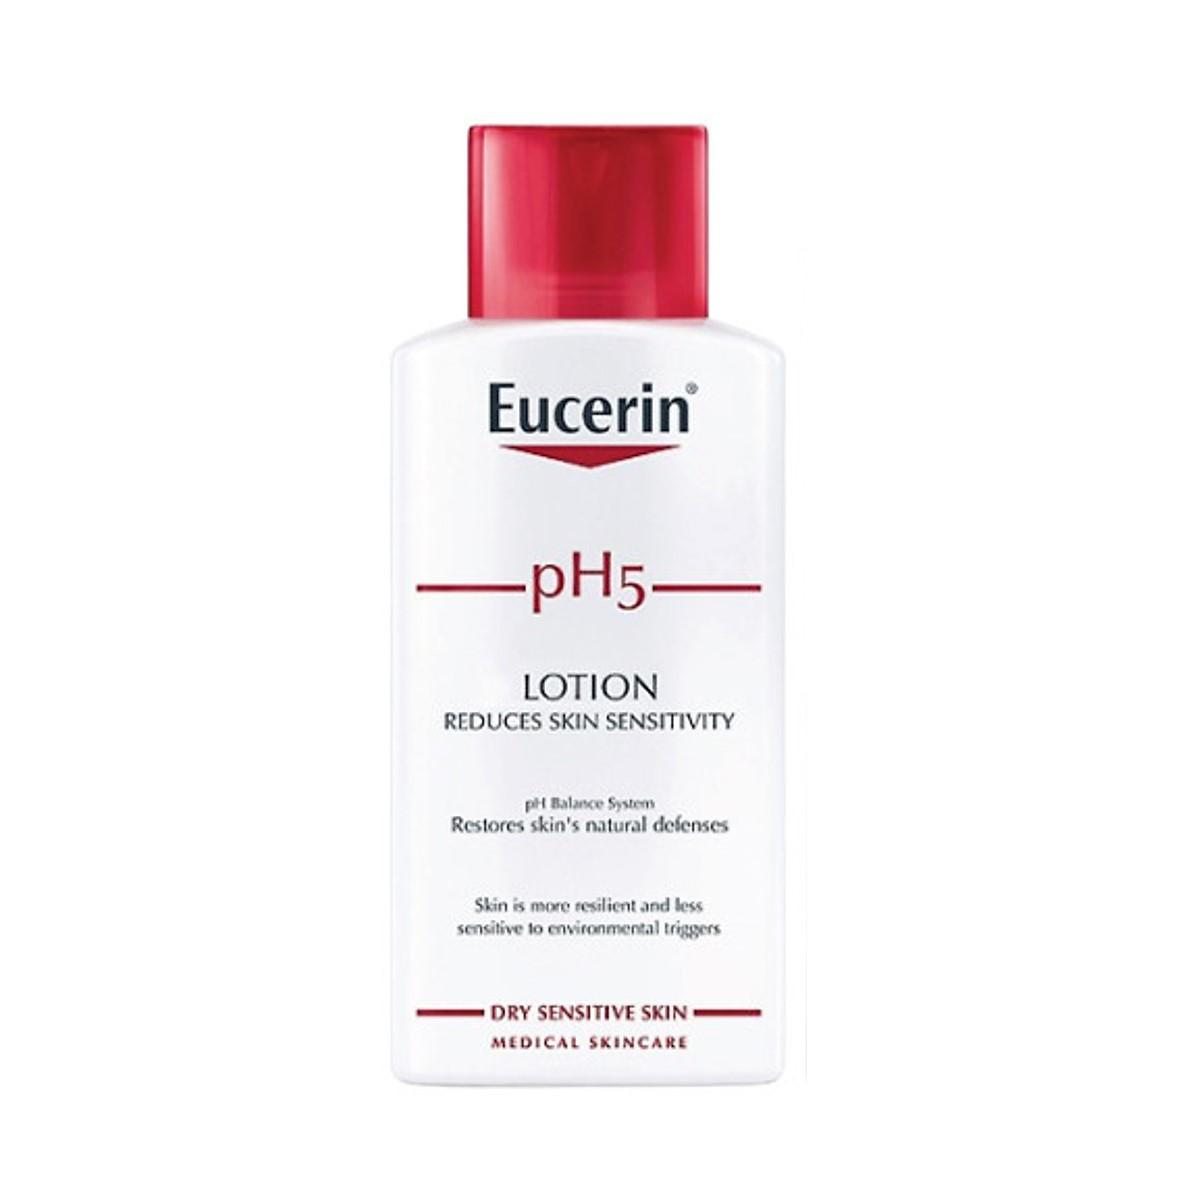 sua-duong-eucerin-ph5-lotion-reduces-skin-sensitivity-review-thanh-phan-gia-cong-dung-29